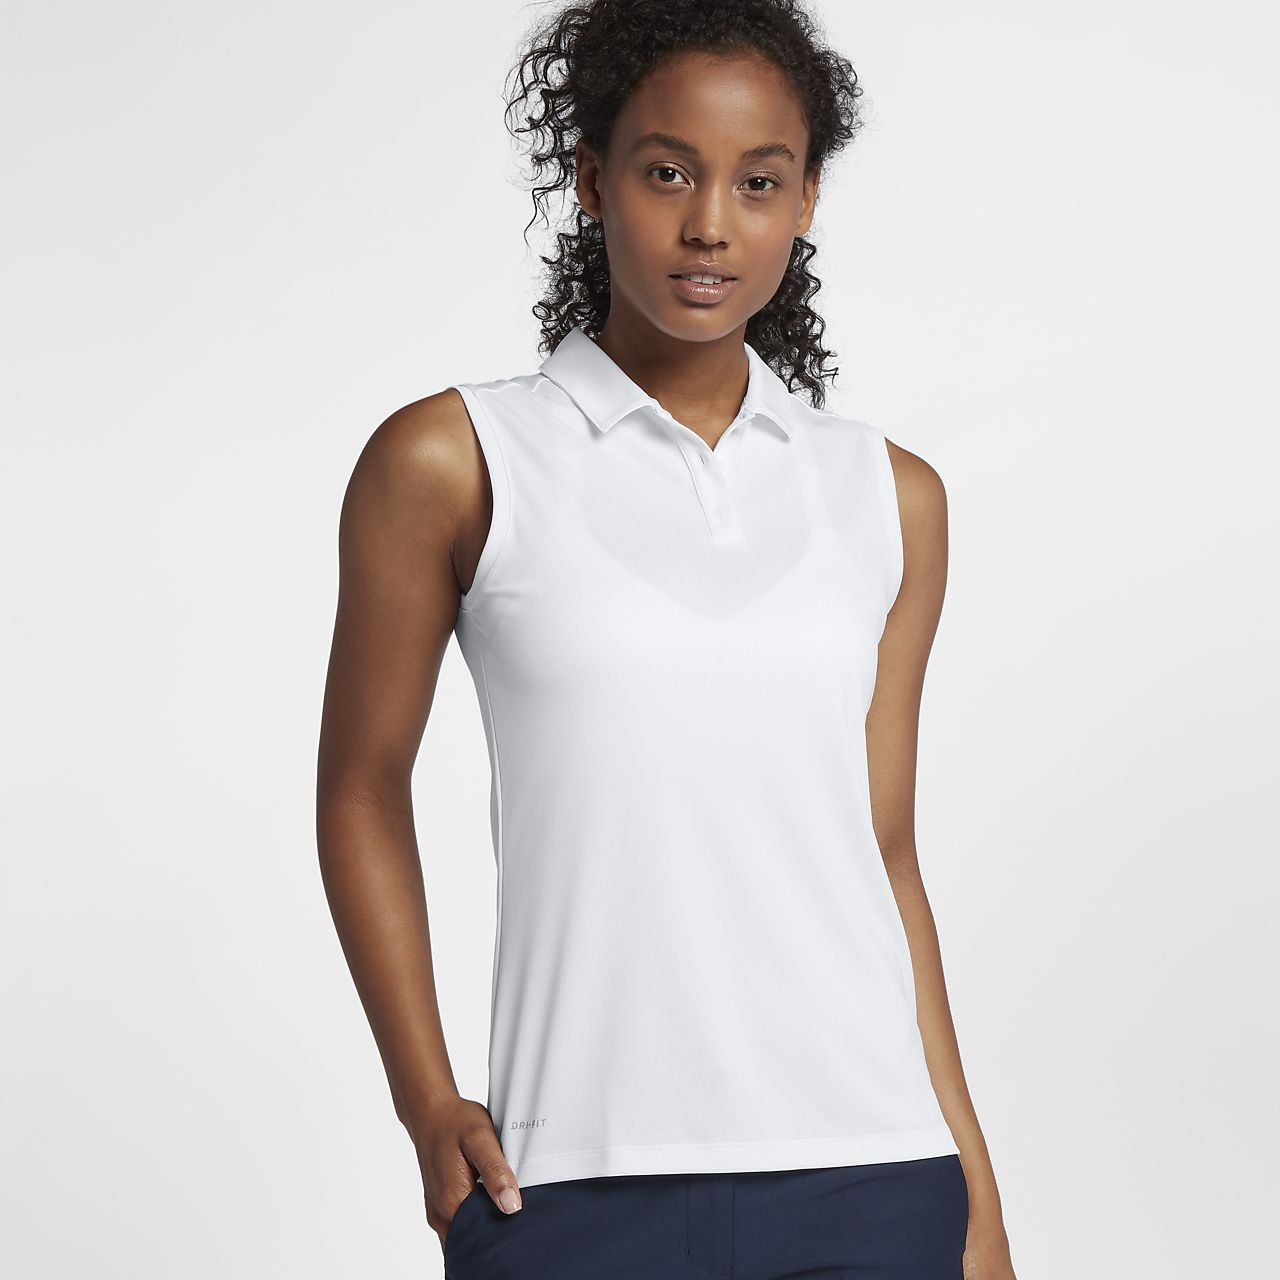 Nike Dri-FIT Golf-Poloshirt für Damen